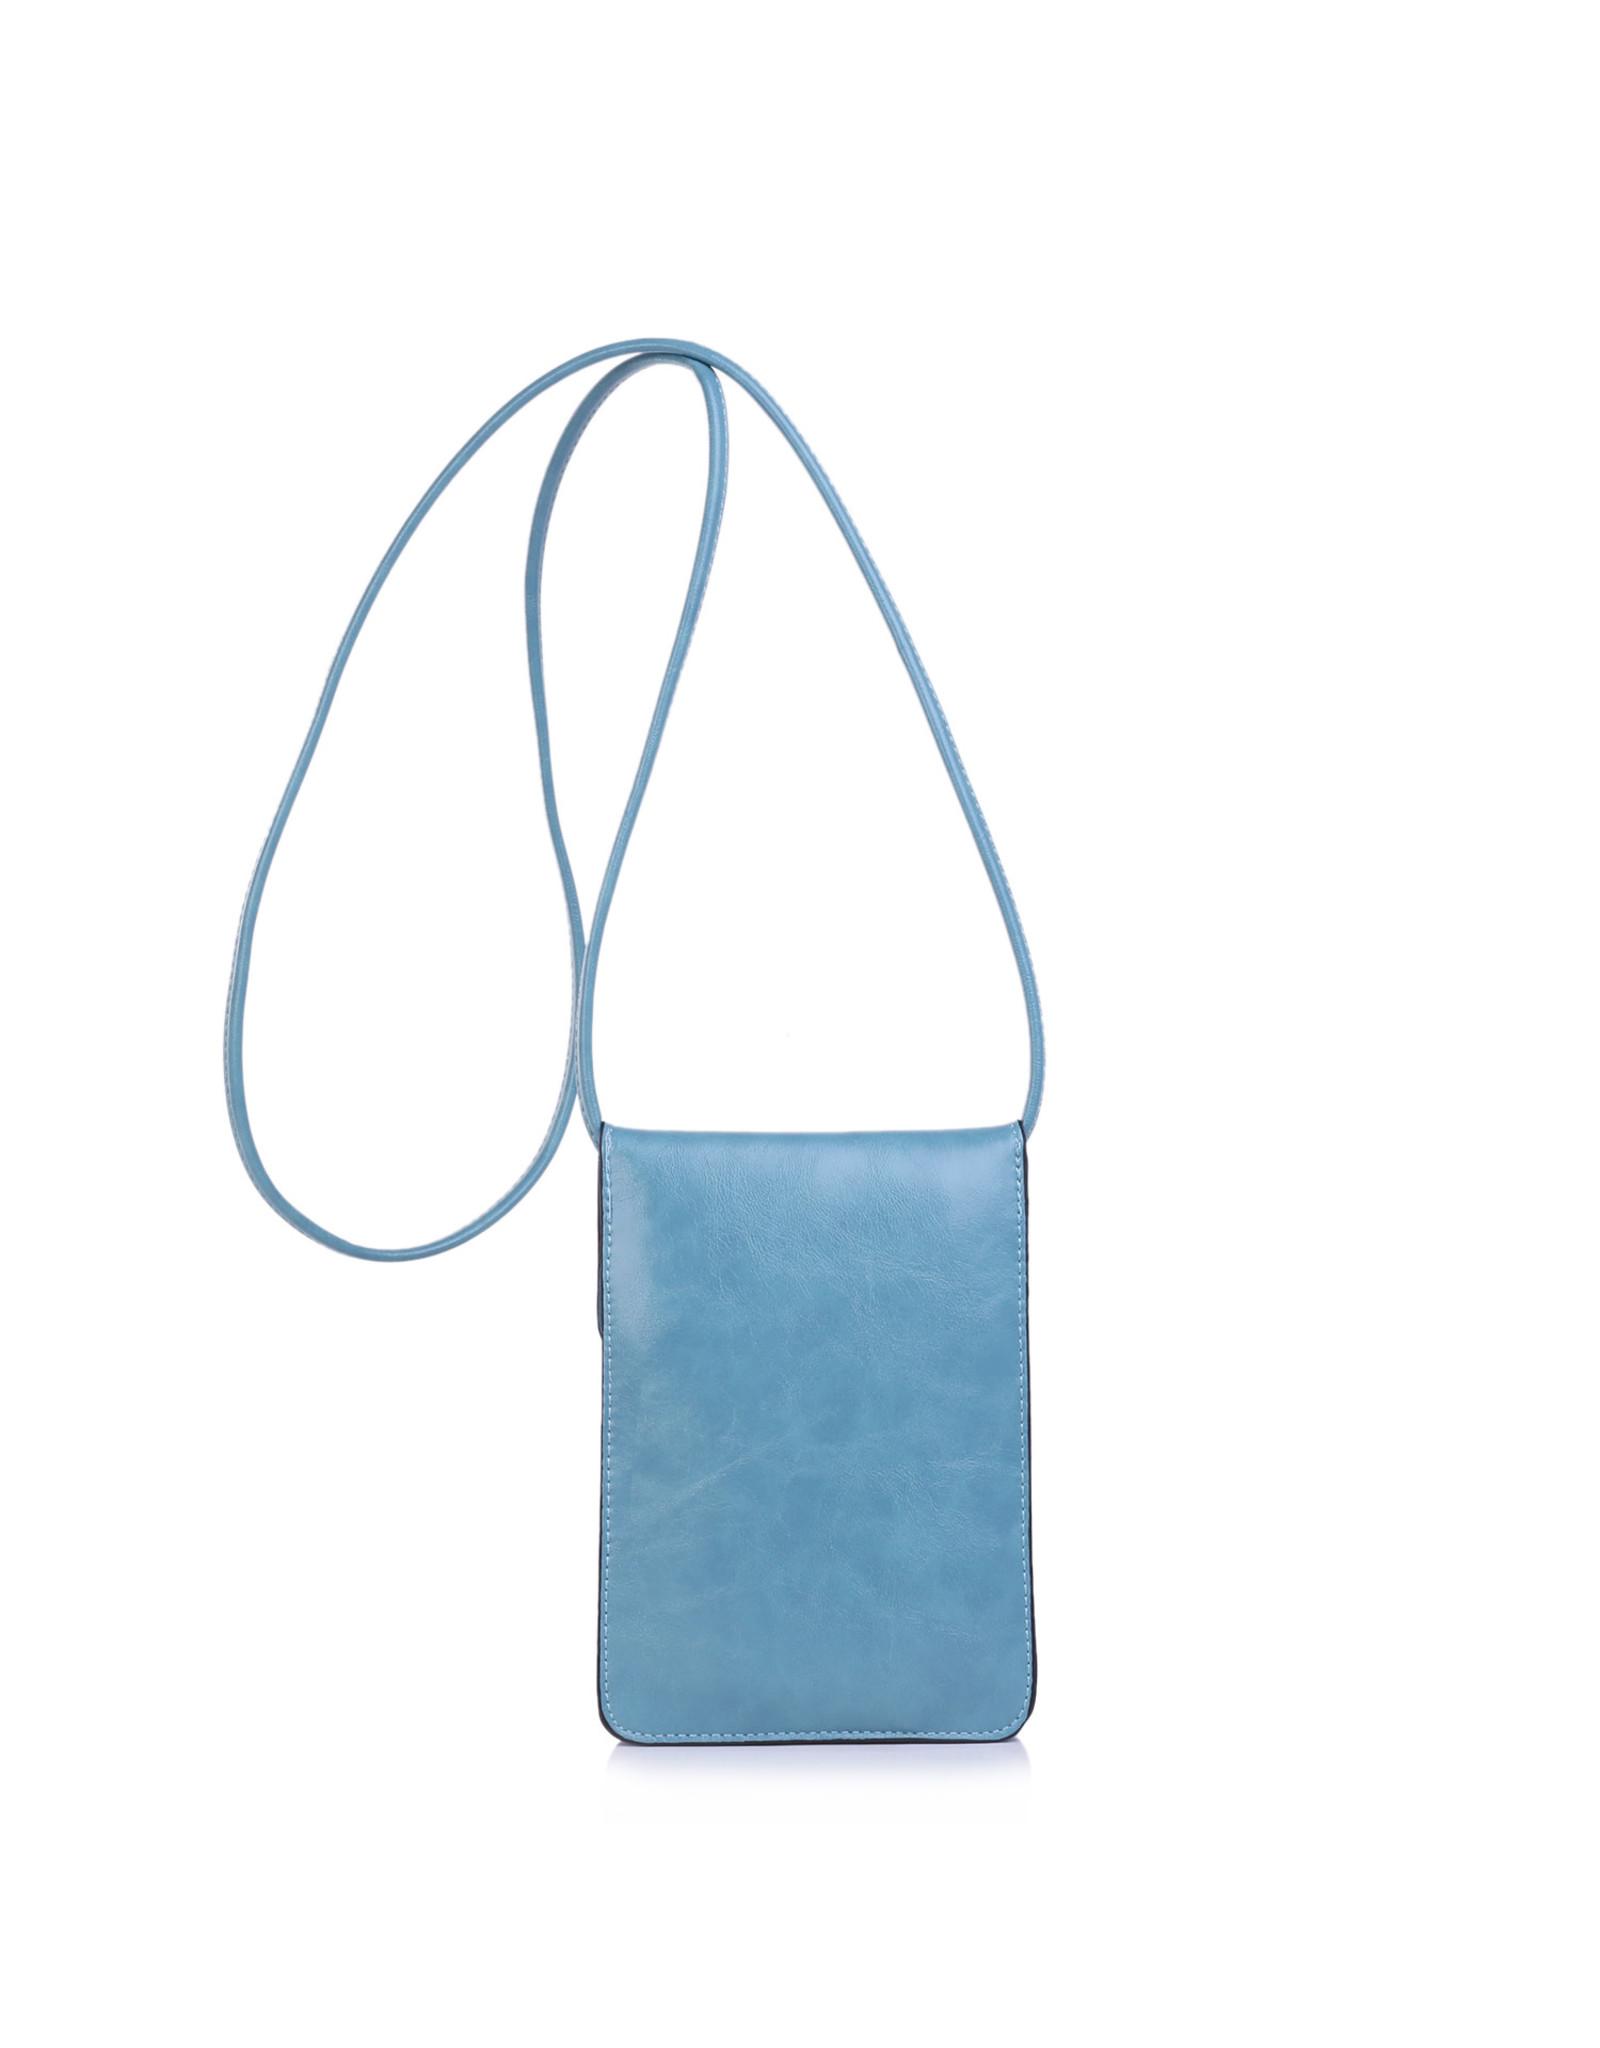 Handtas mini lichtblauw